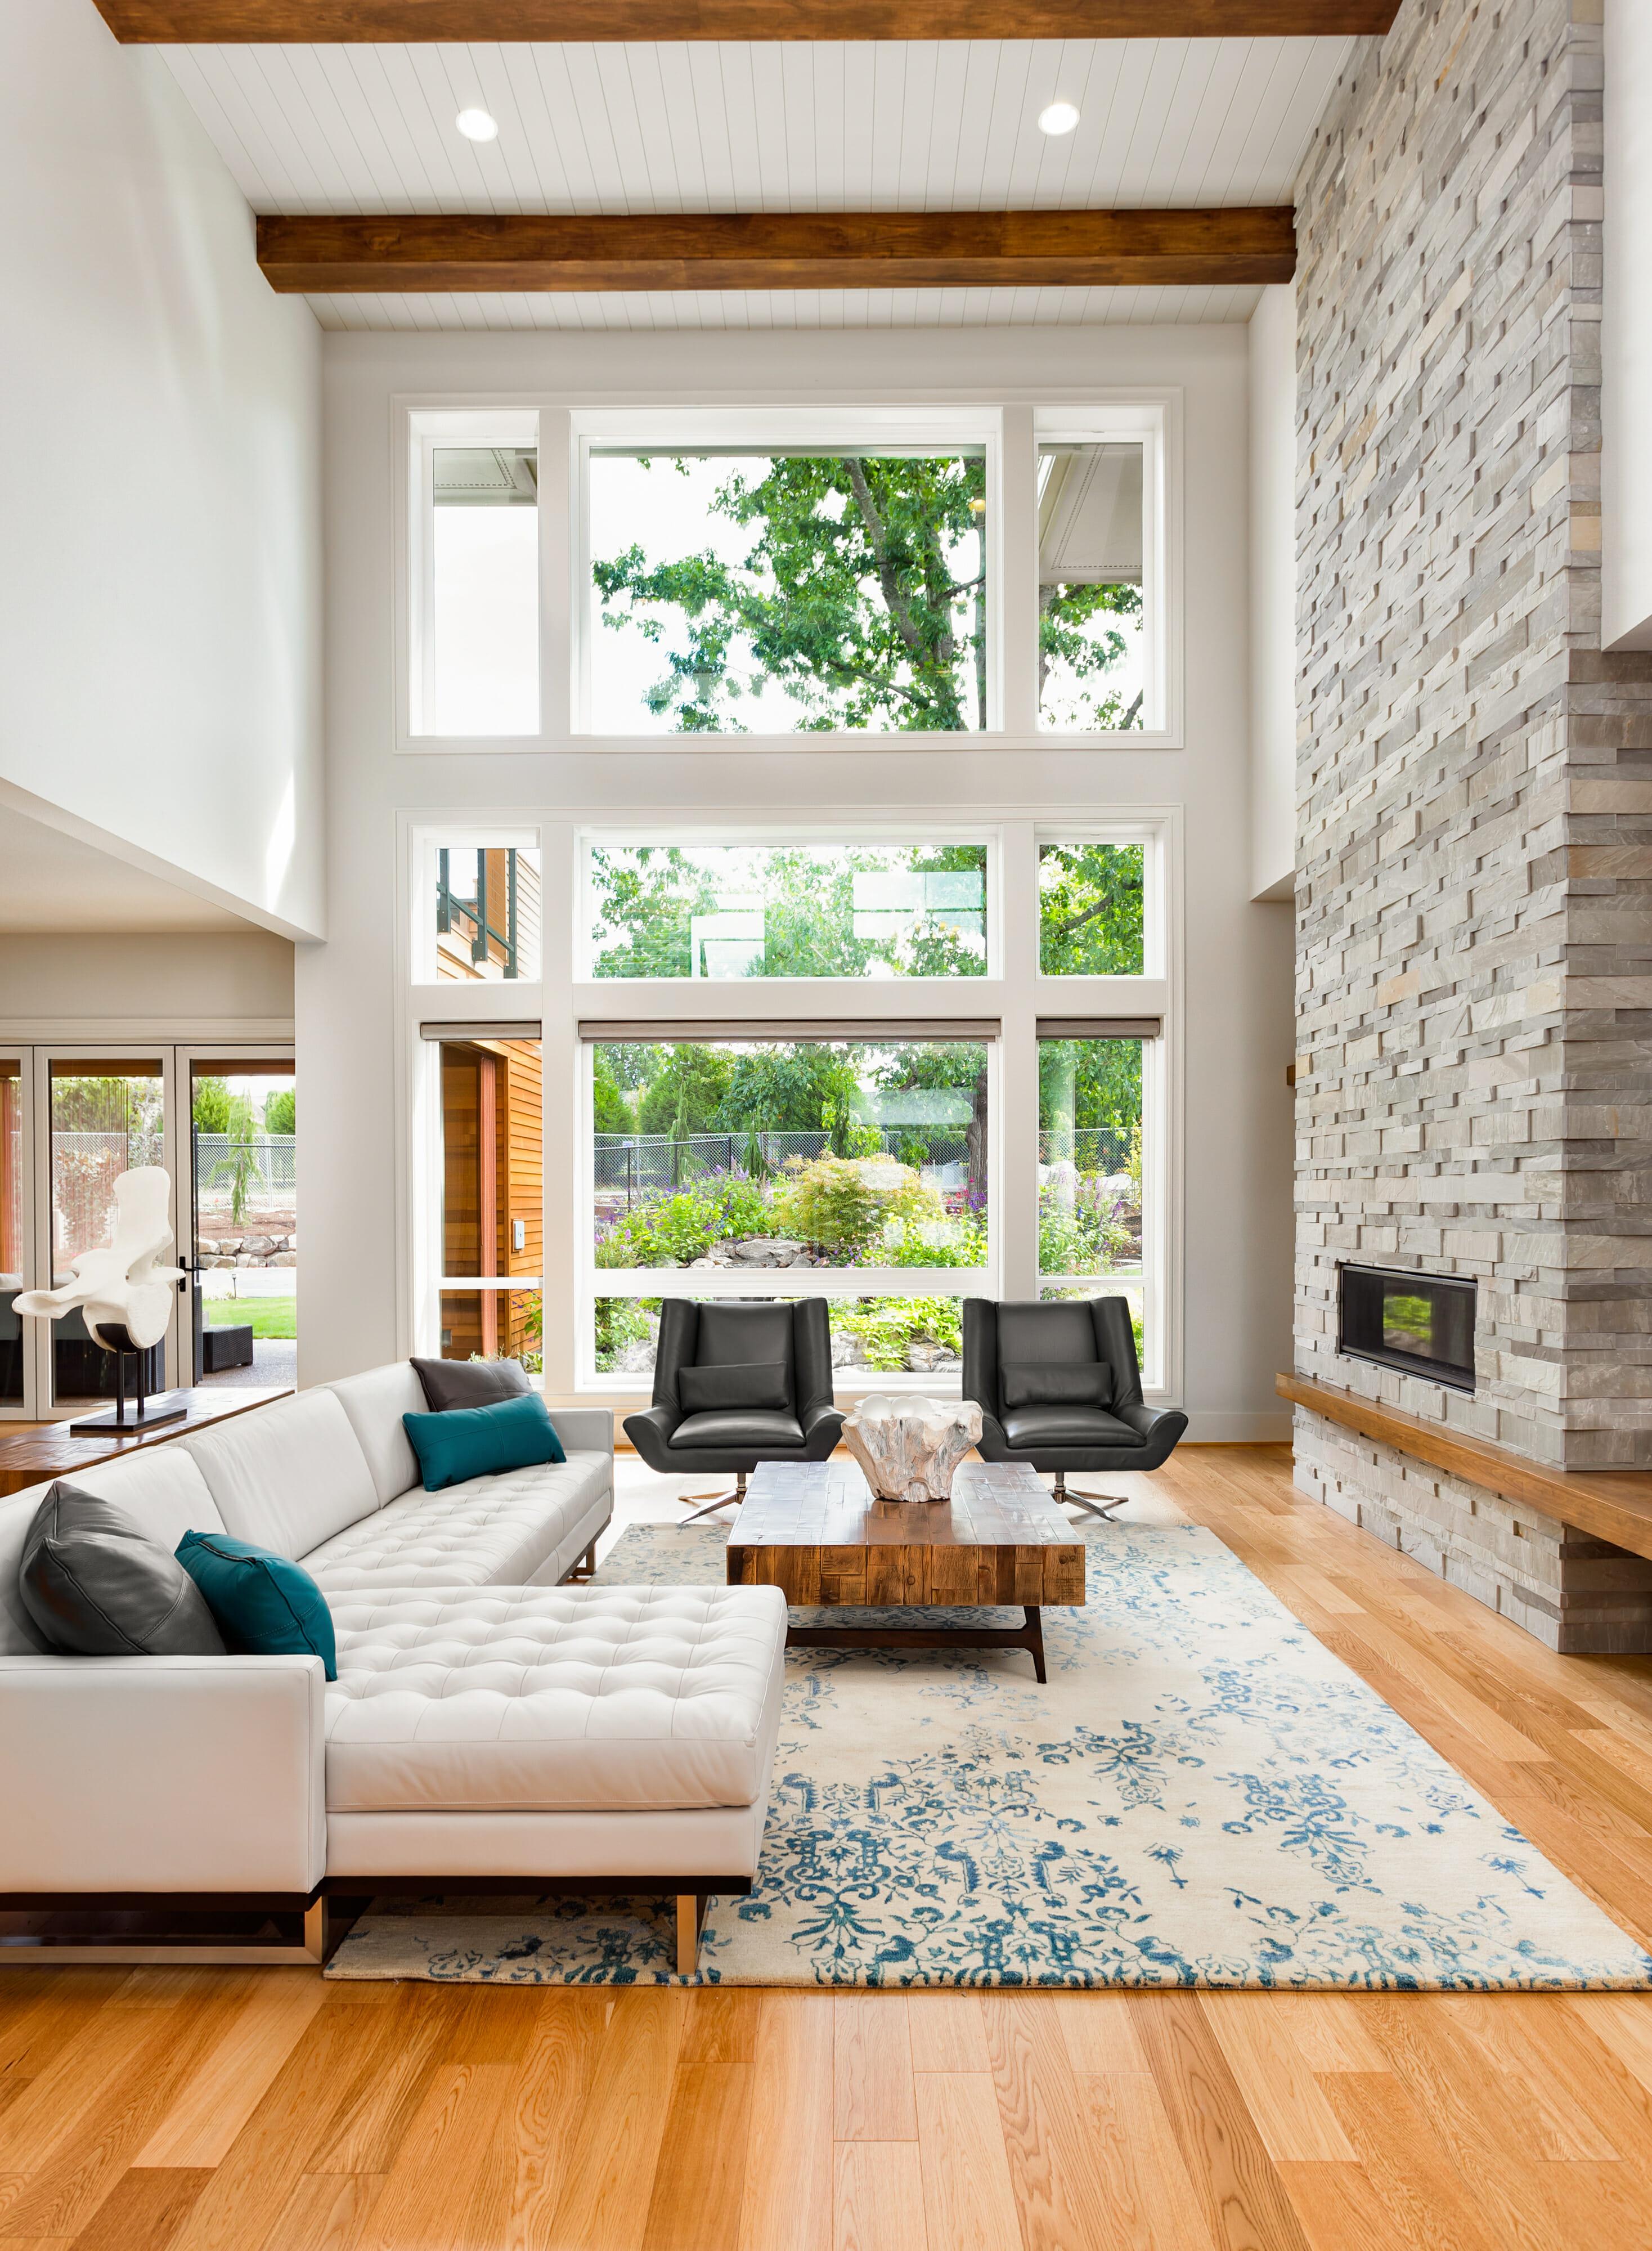 Online Interior Designer Spotlight: Amelia Rozas